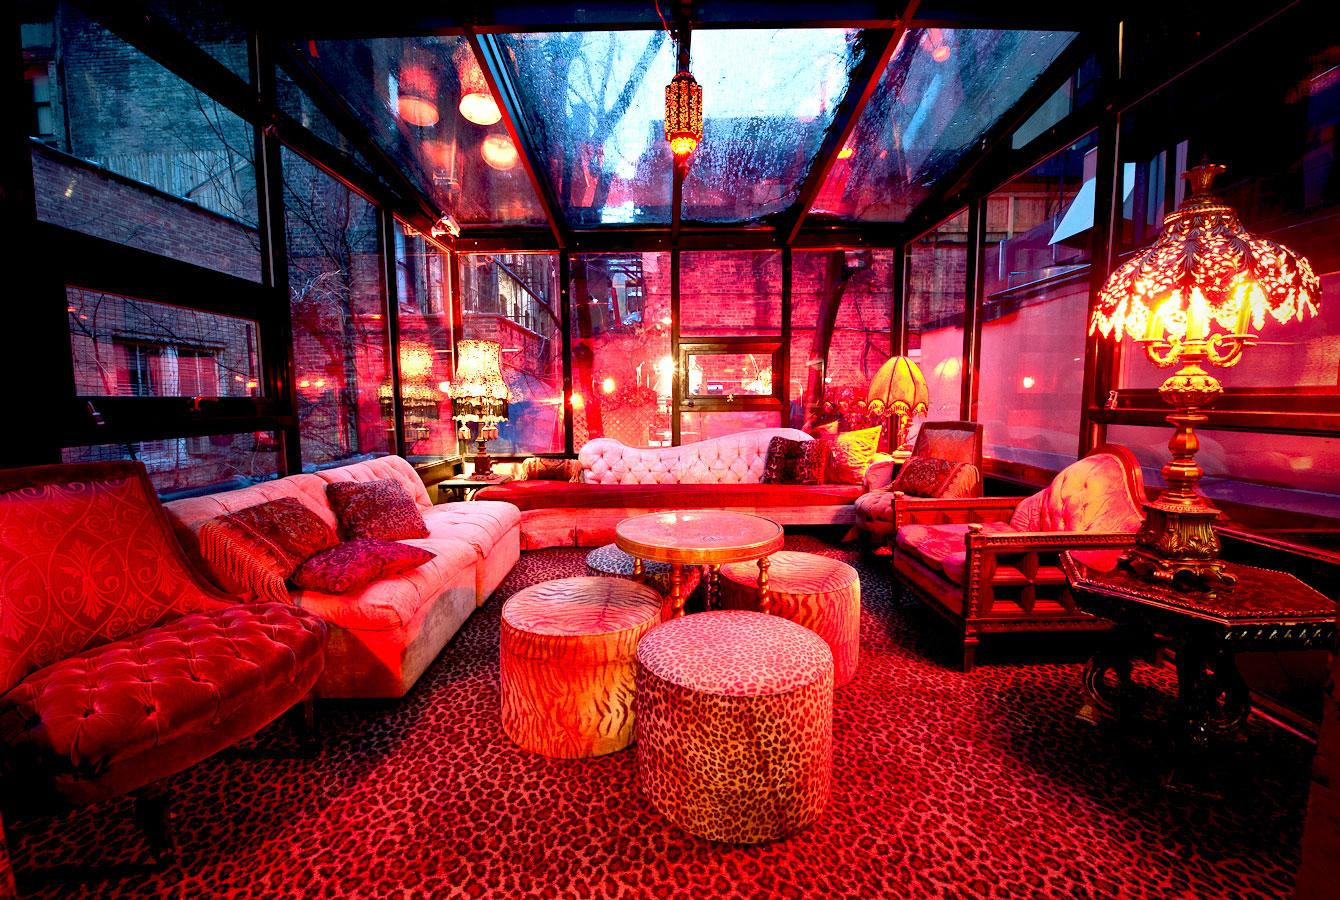 Bedouin Lounge Atrium Madame X